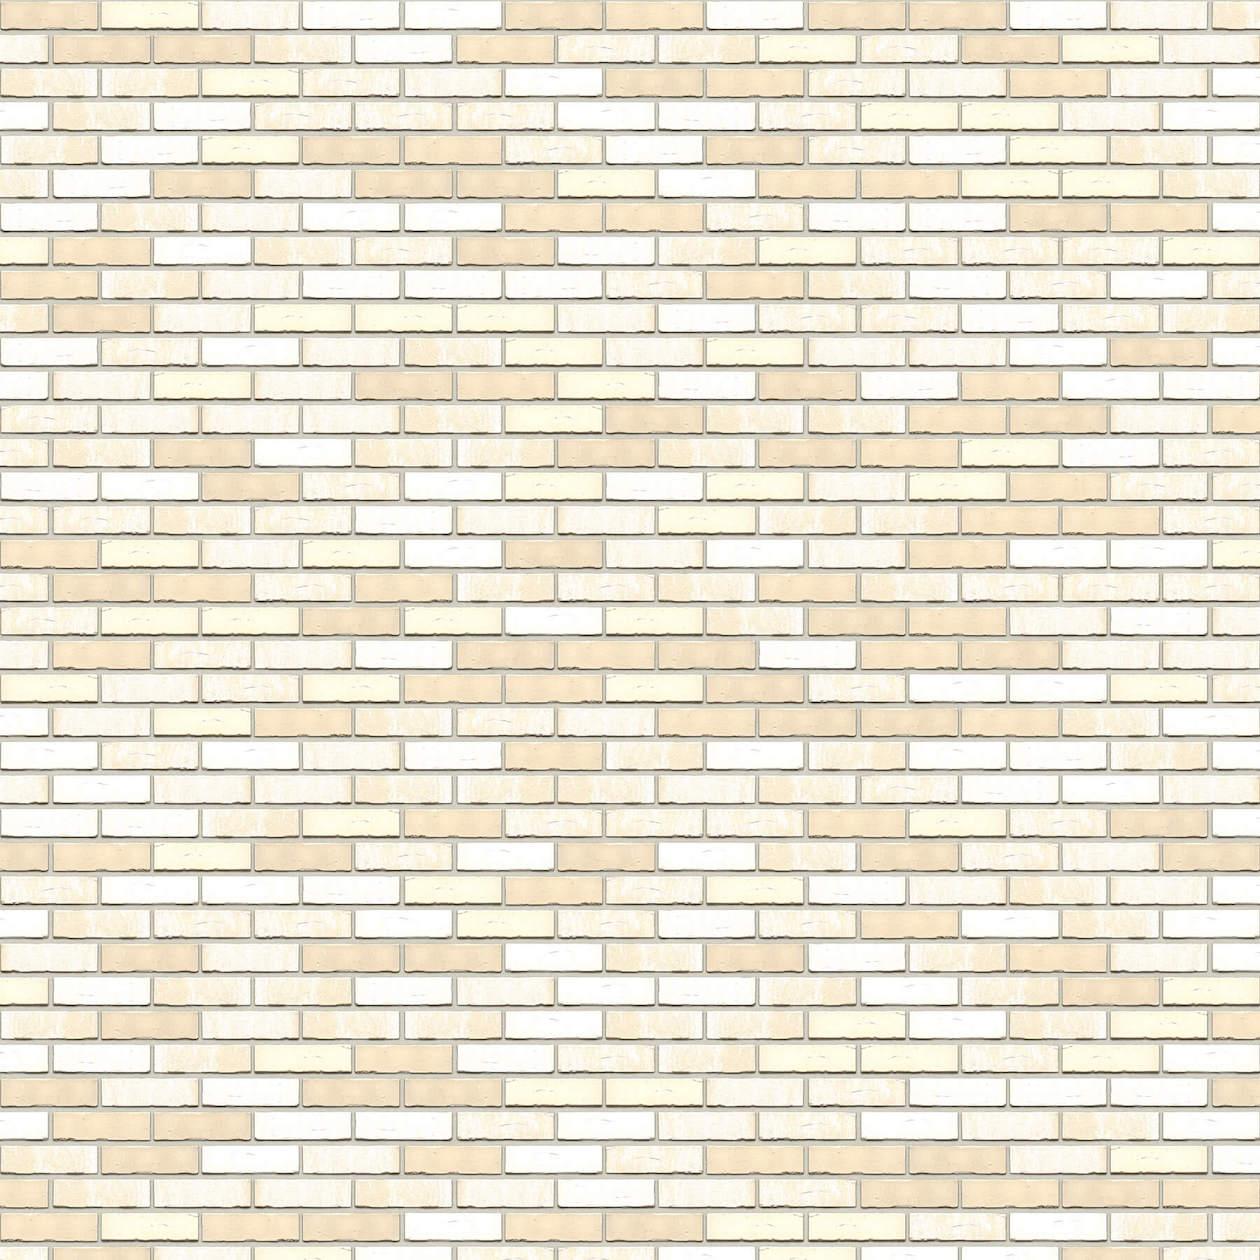 Puna-cigla-FeldHaus-Klinker-brick-house-nf-k-733-Bela Fuga